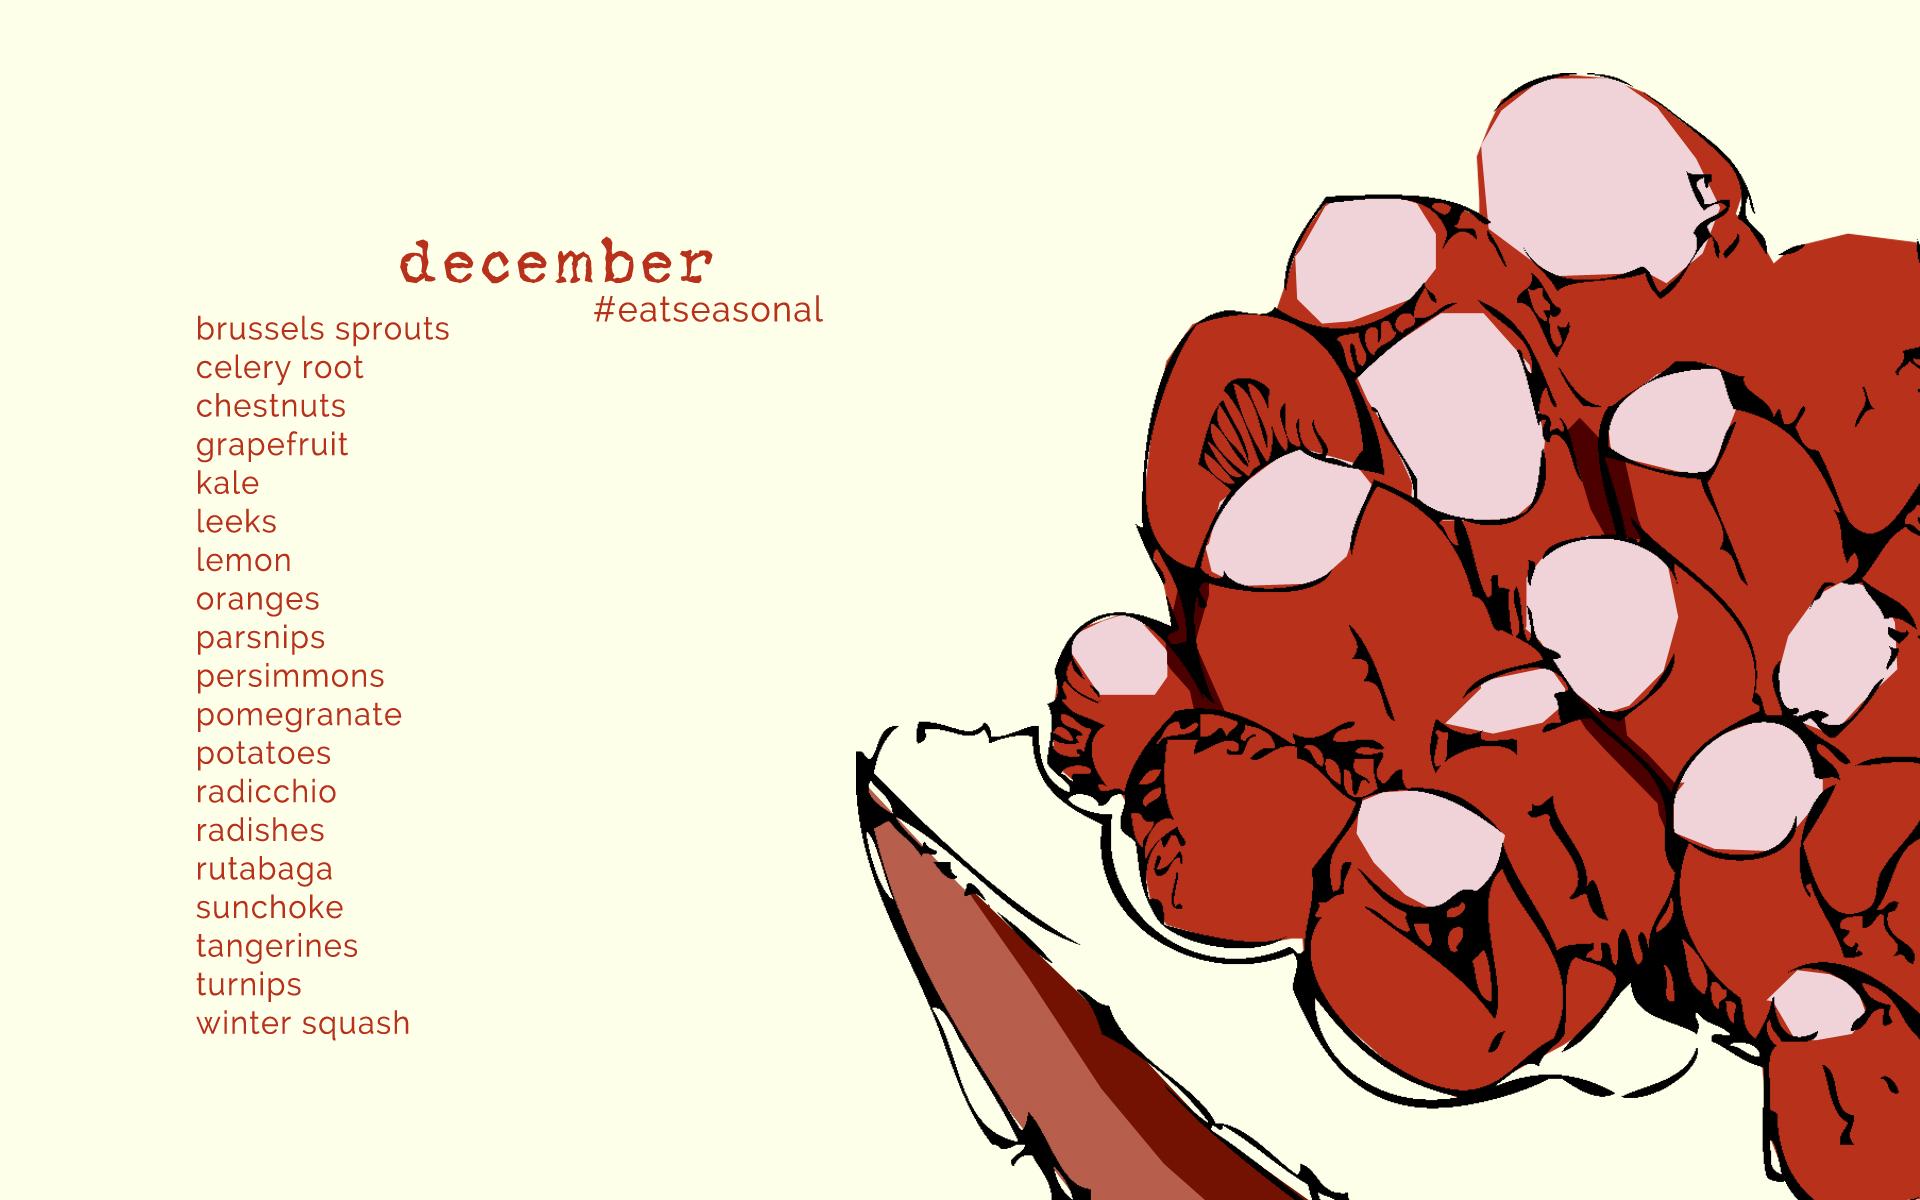 December Seasonal Produce List • theVintageMixer.com #eatseasonal